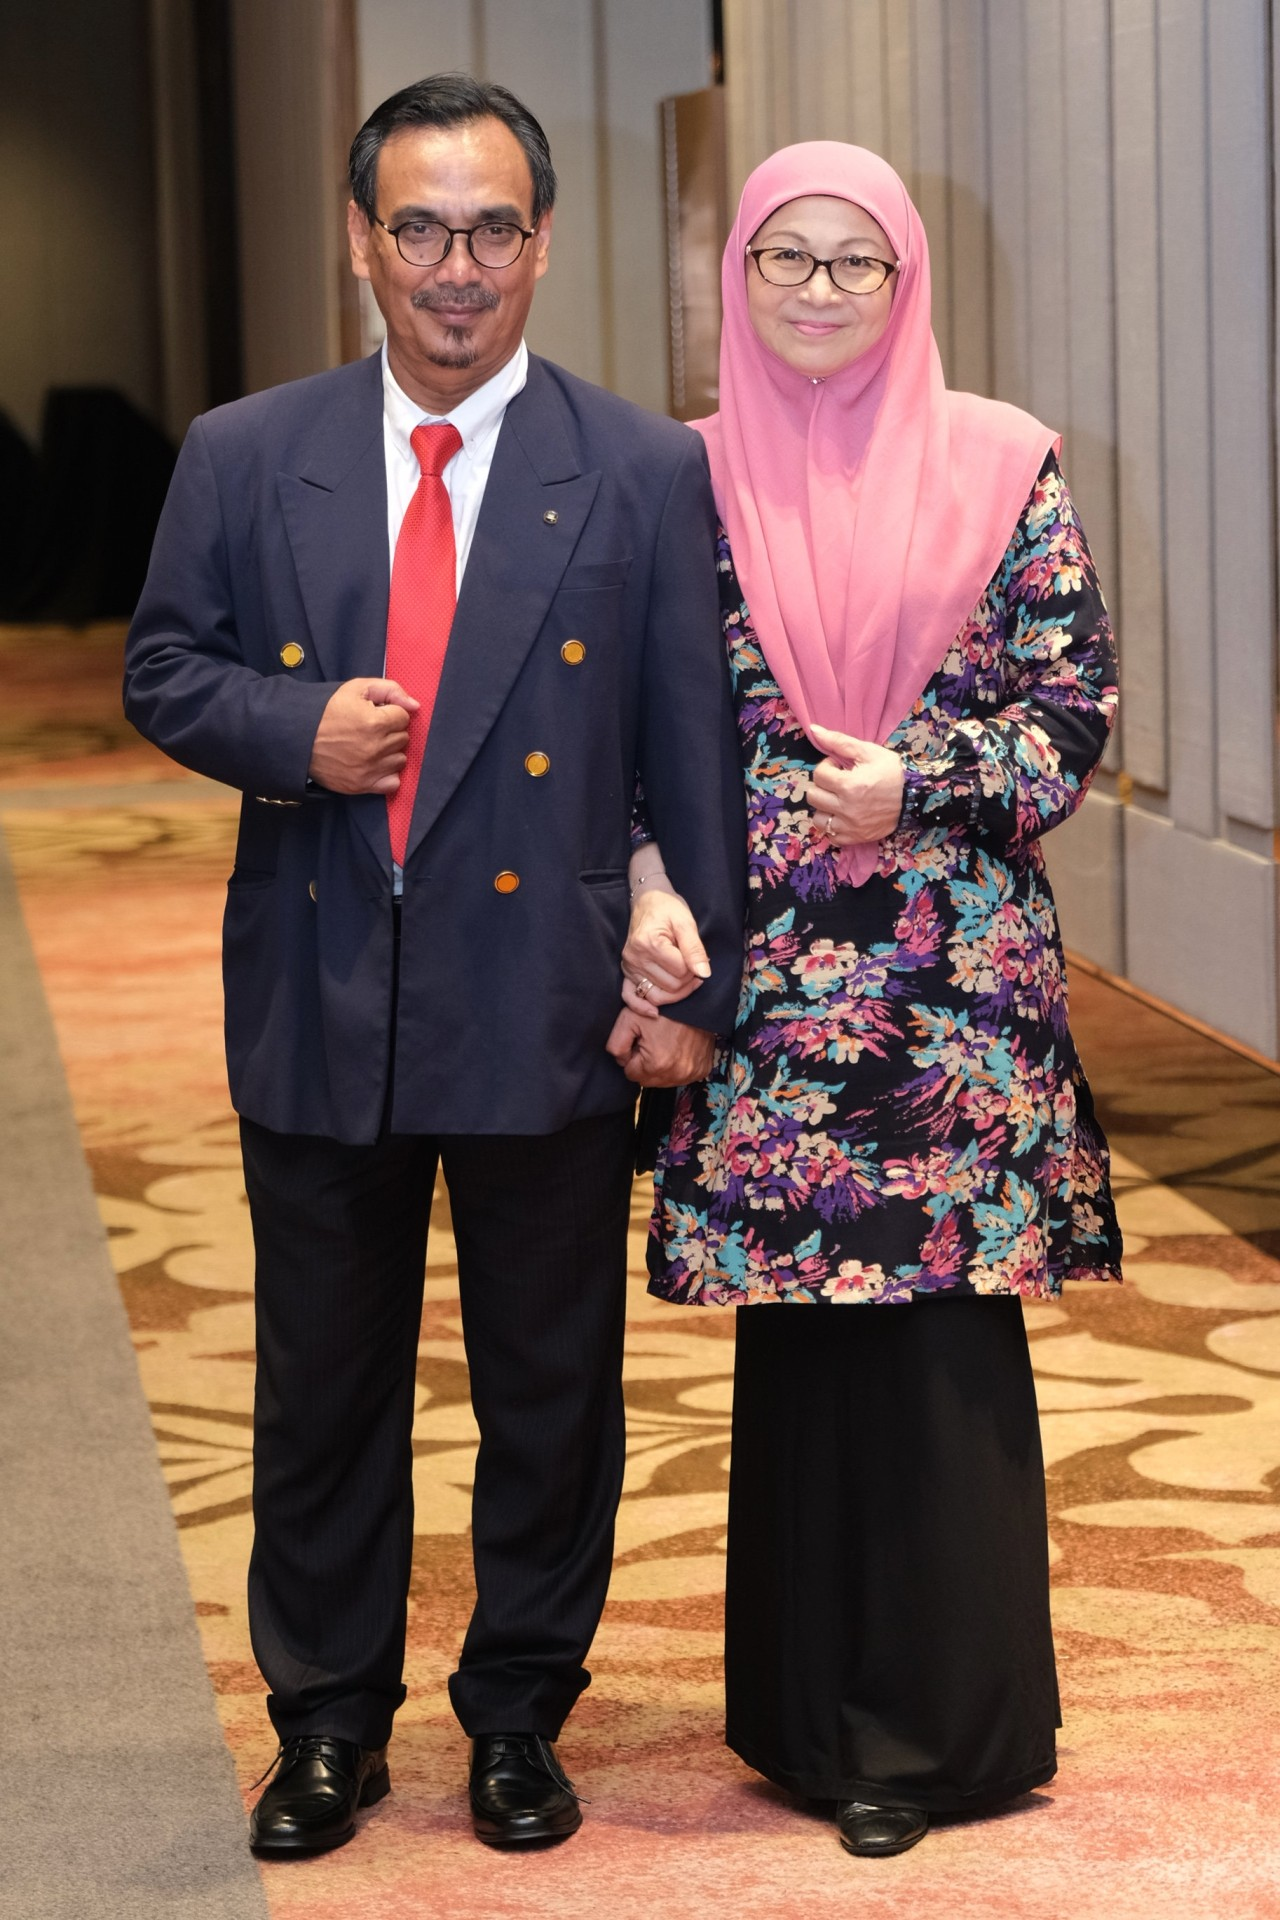 Hilal Azman (left) as Datuk Seri Anwar Ibrahim and Dian P. Ramlee as Datuk Seri Dr. Wan Azizah Wan Ismail.